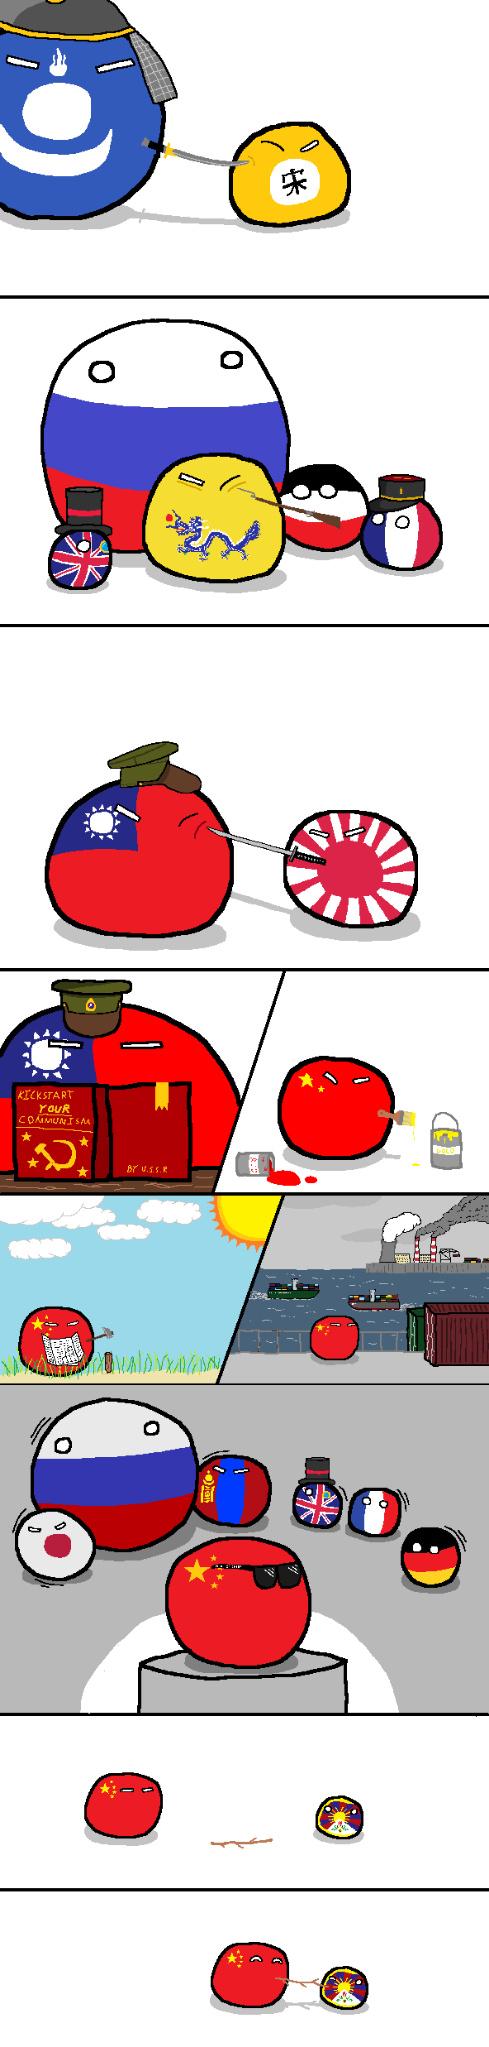 China: History - meme